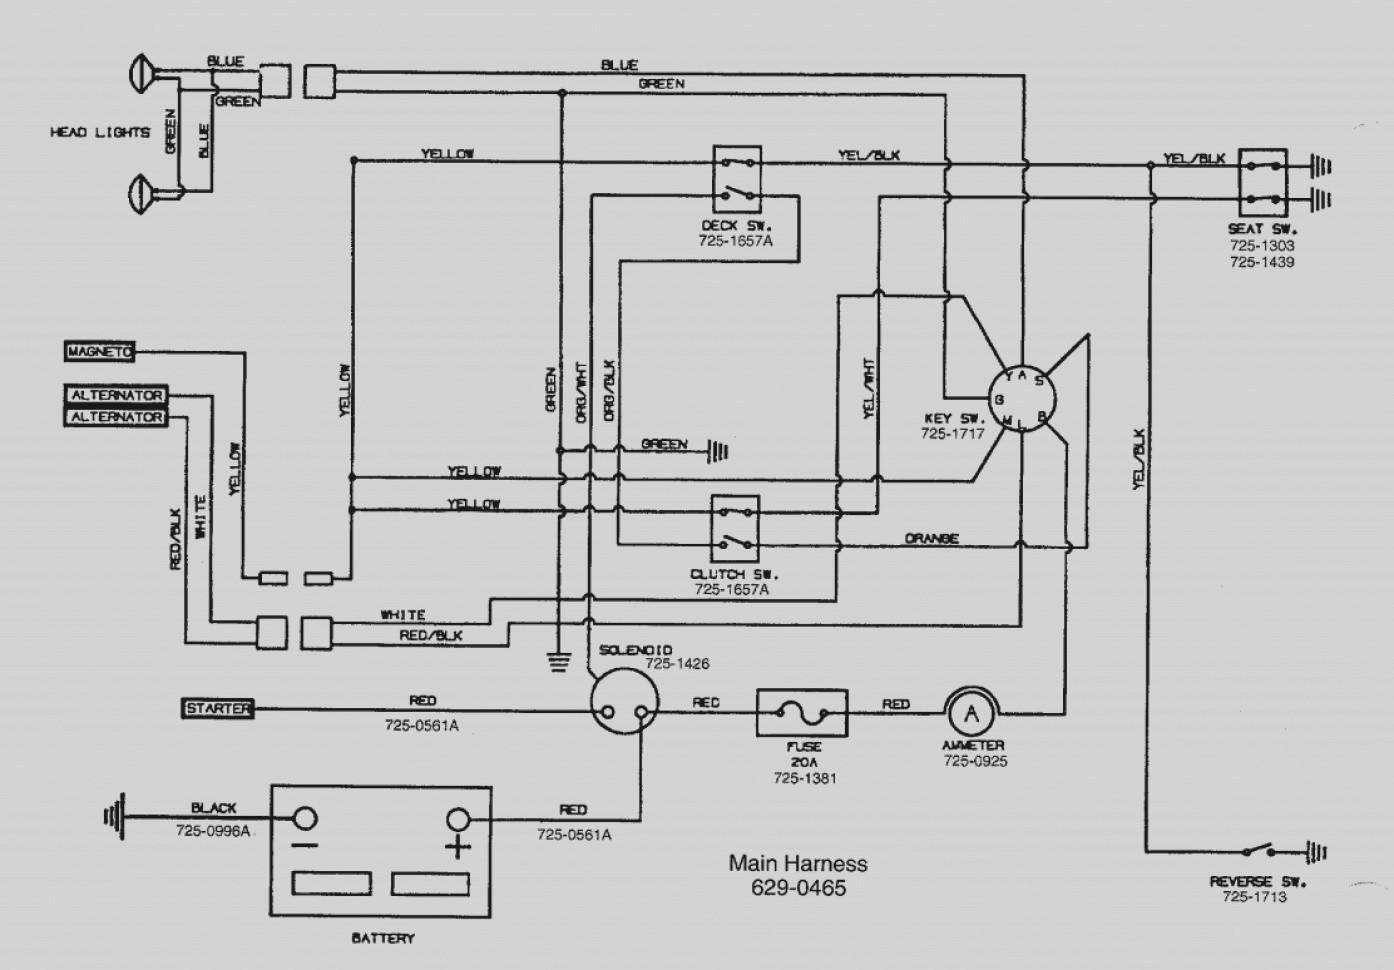 42a707 Wiring Diagram Schema Online John Deere Lawn Tractor Diagrams Briggs Schematic